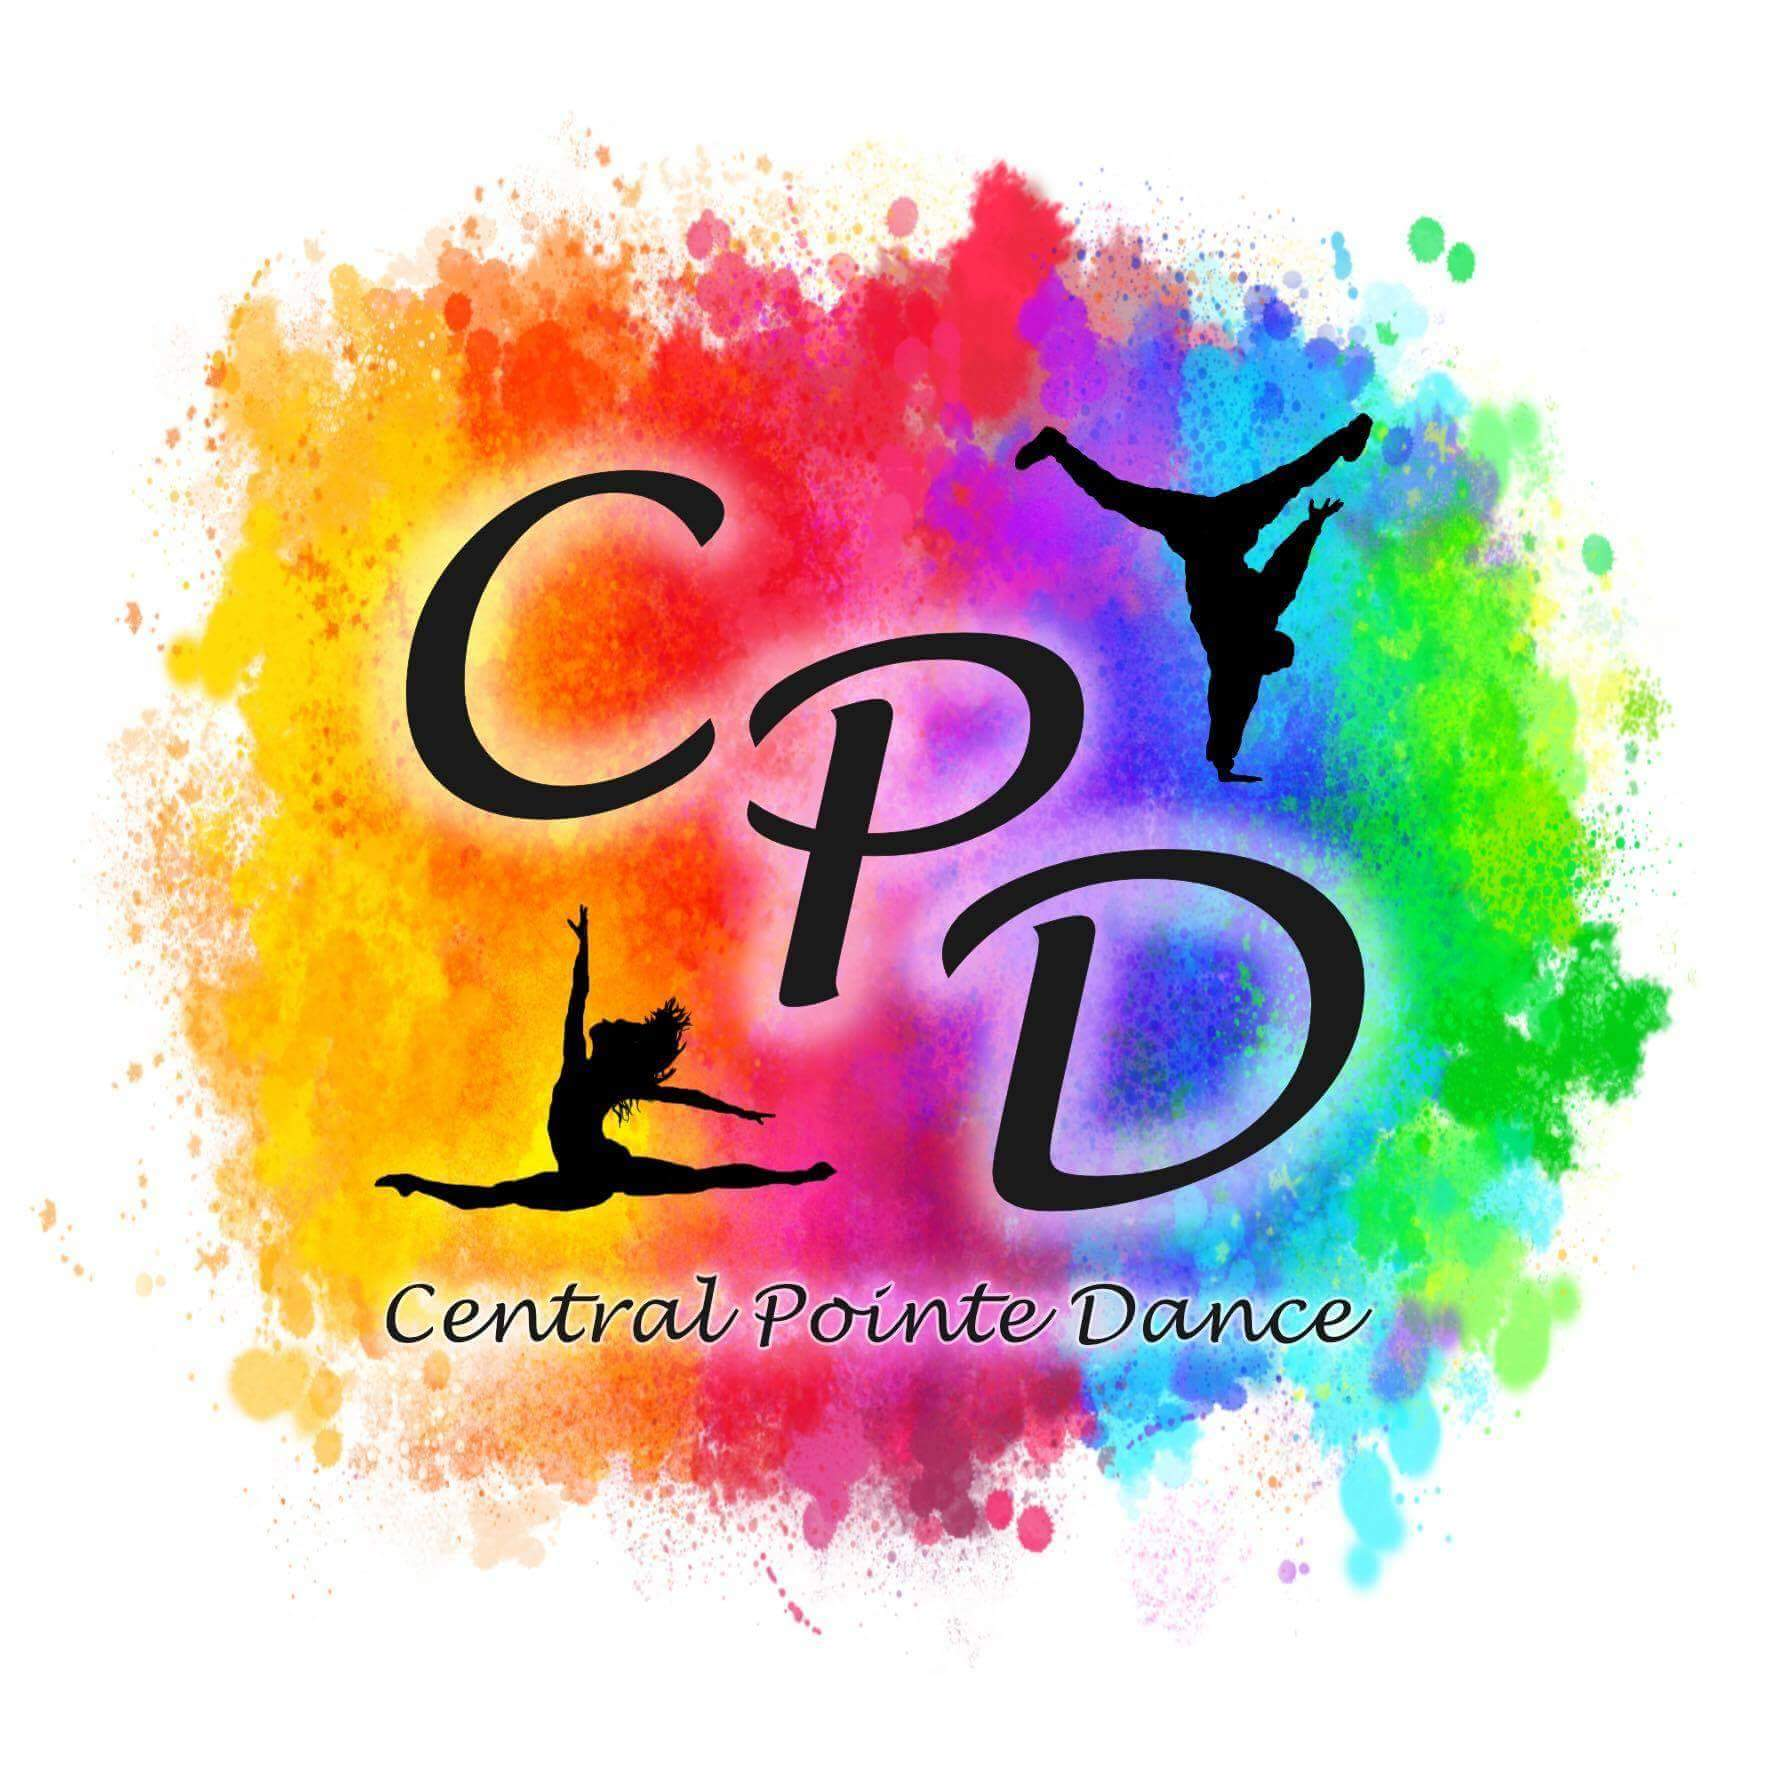 Central Pointe Dance Batley